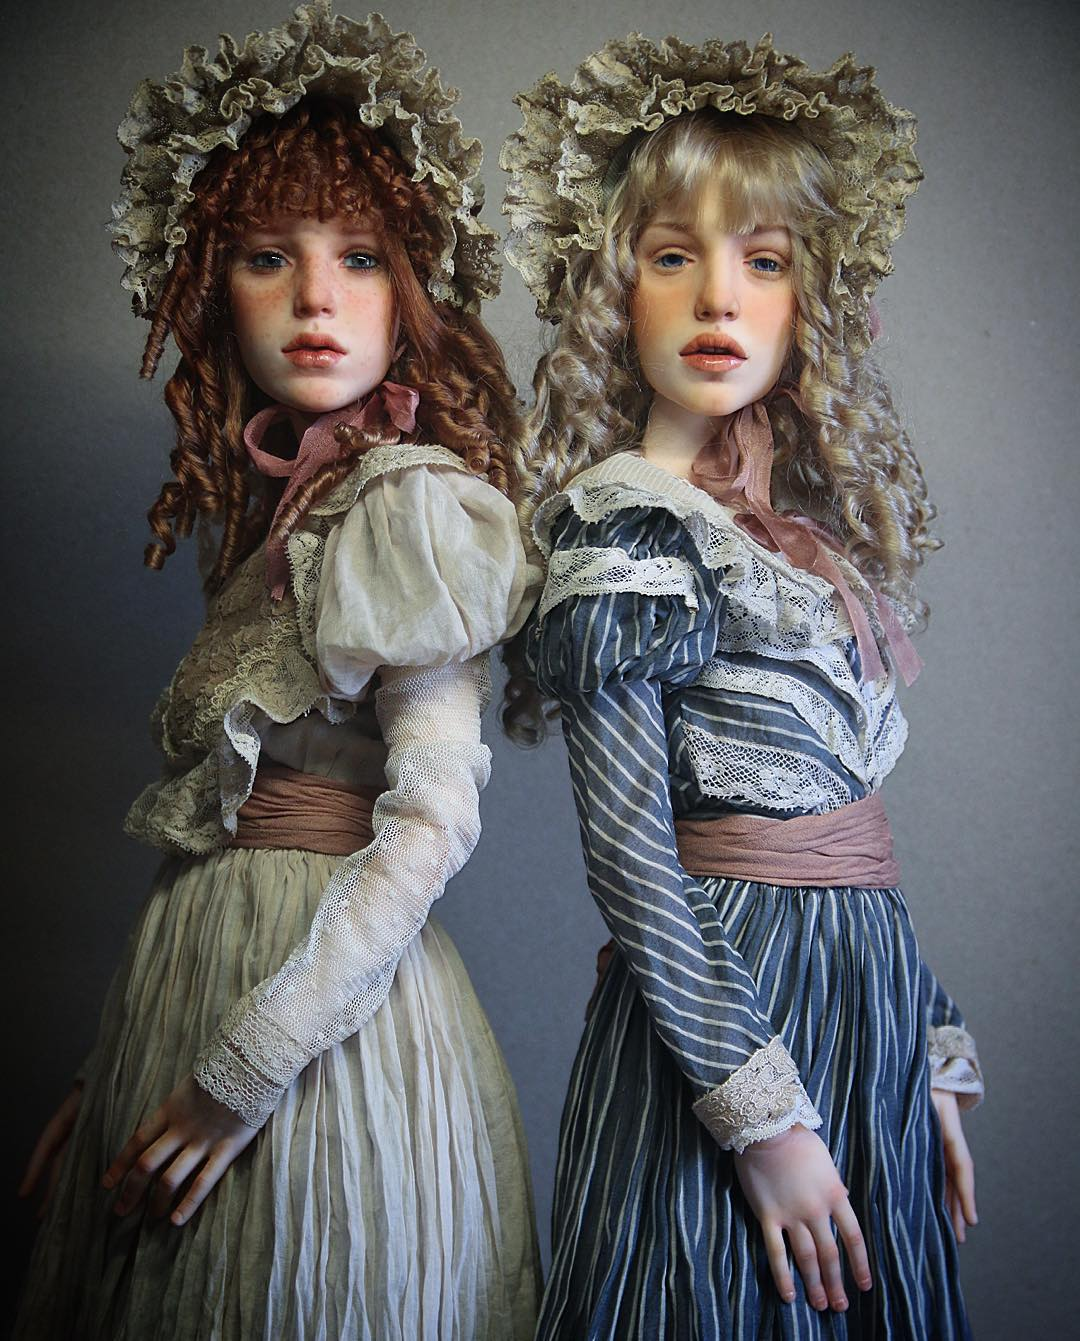 hyper-realistic-dolls-michael-zajkov-4